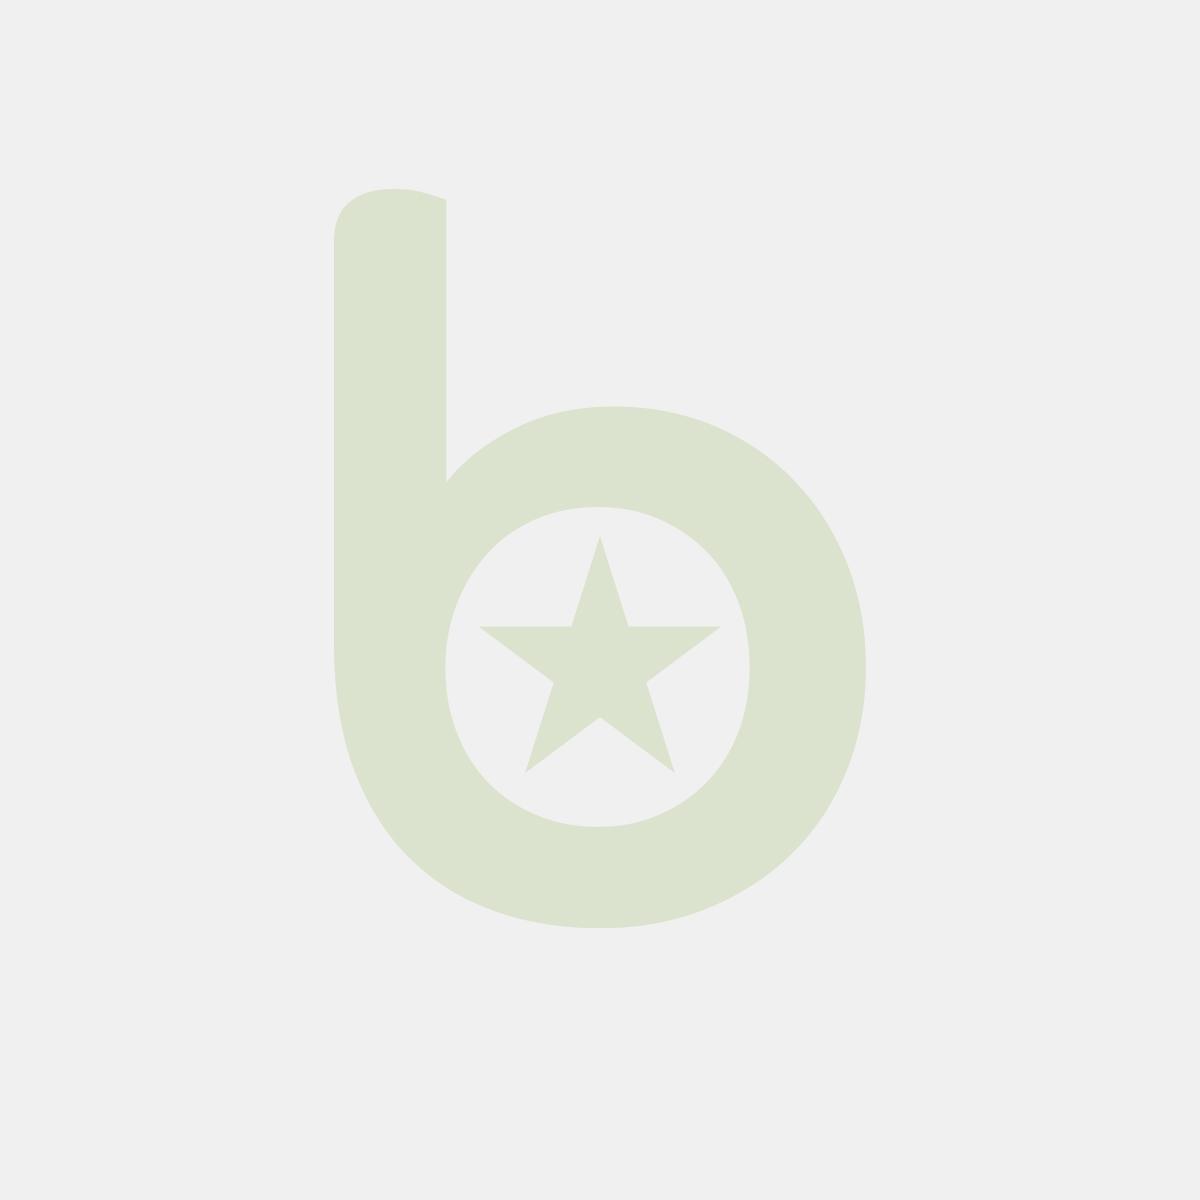 Taca drewnopodobna prostokątna 32x26cm szara GN1/2, melamina